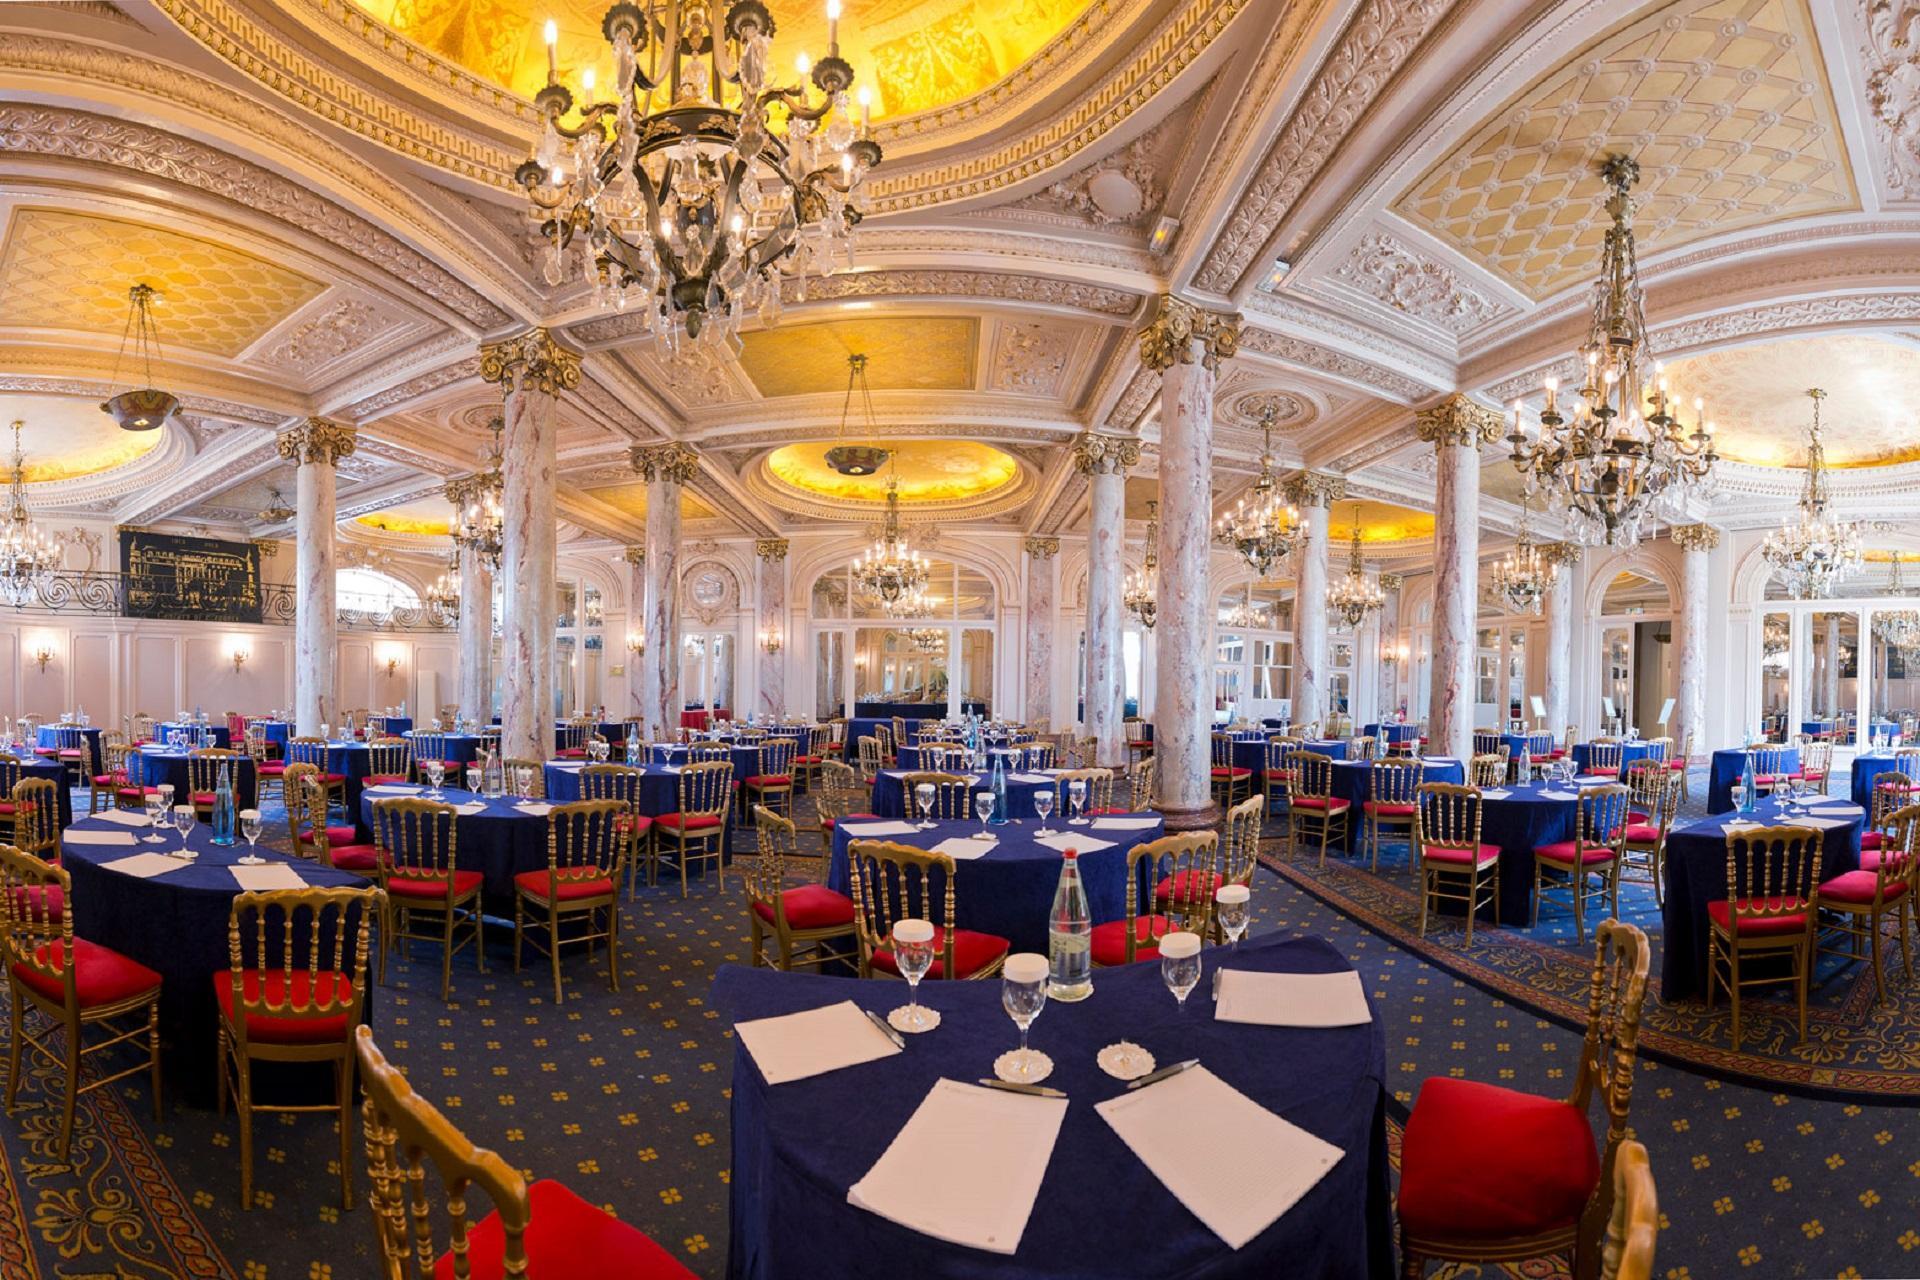 Carlton-Cannes-French-Riviera-cote-dazur-Croisette-meeting